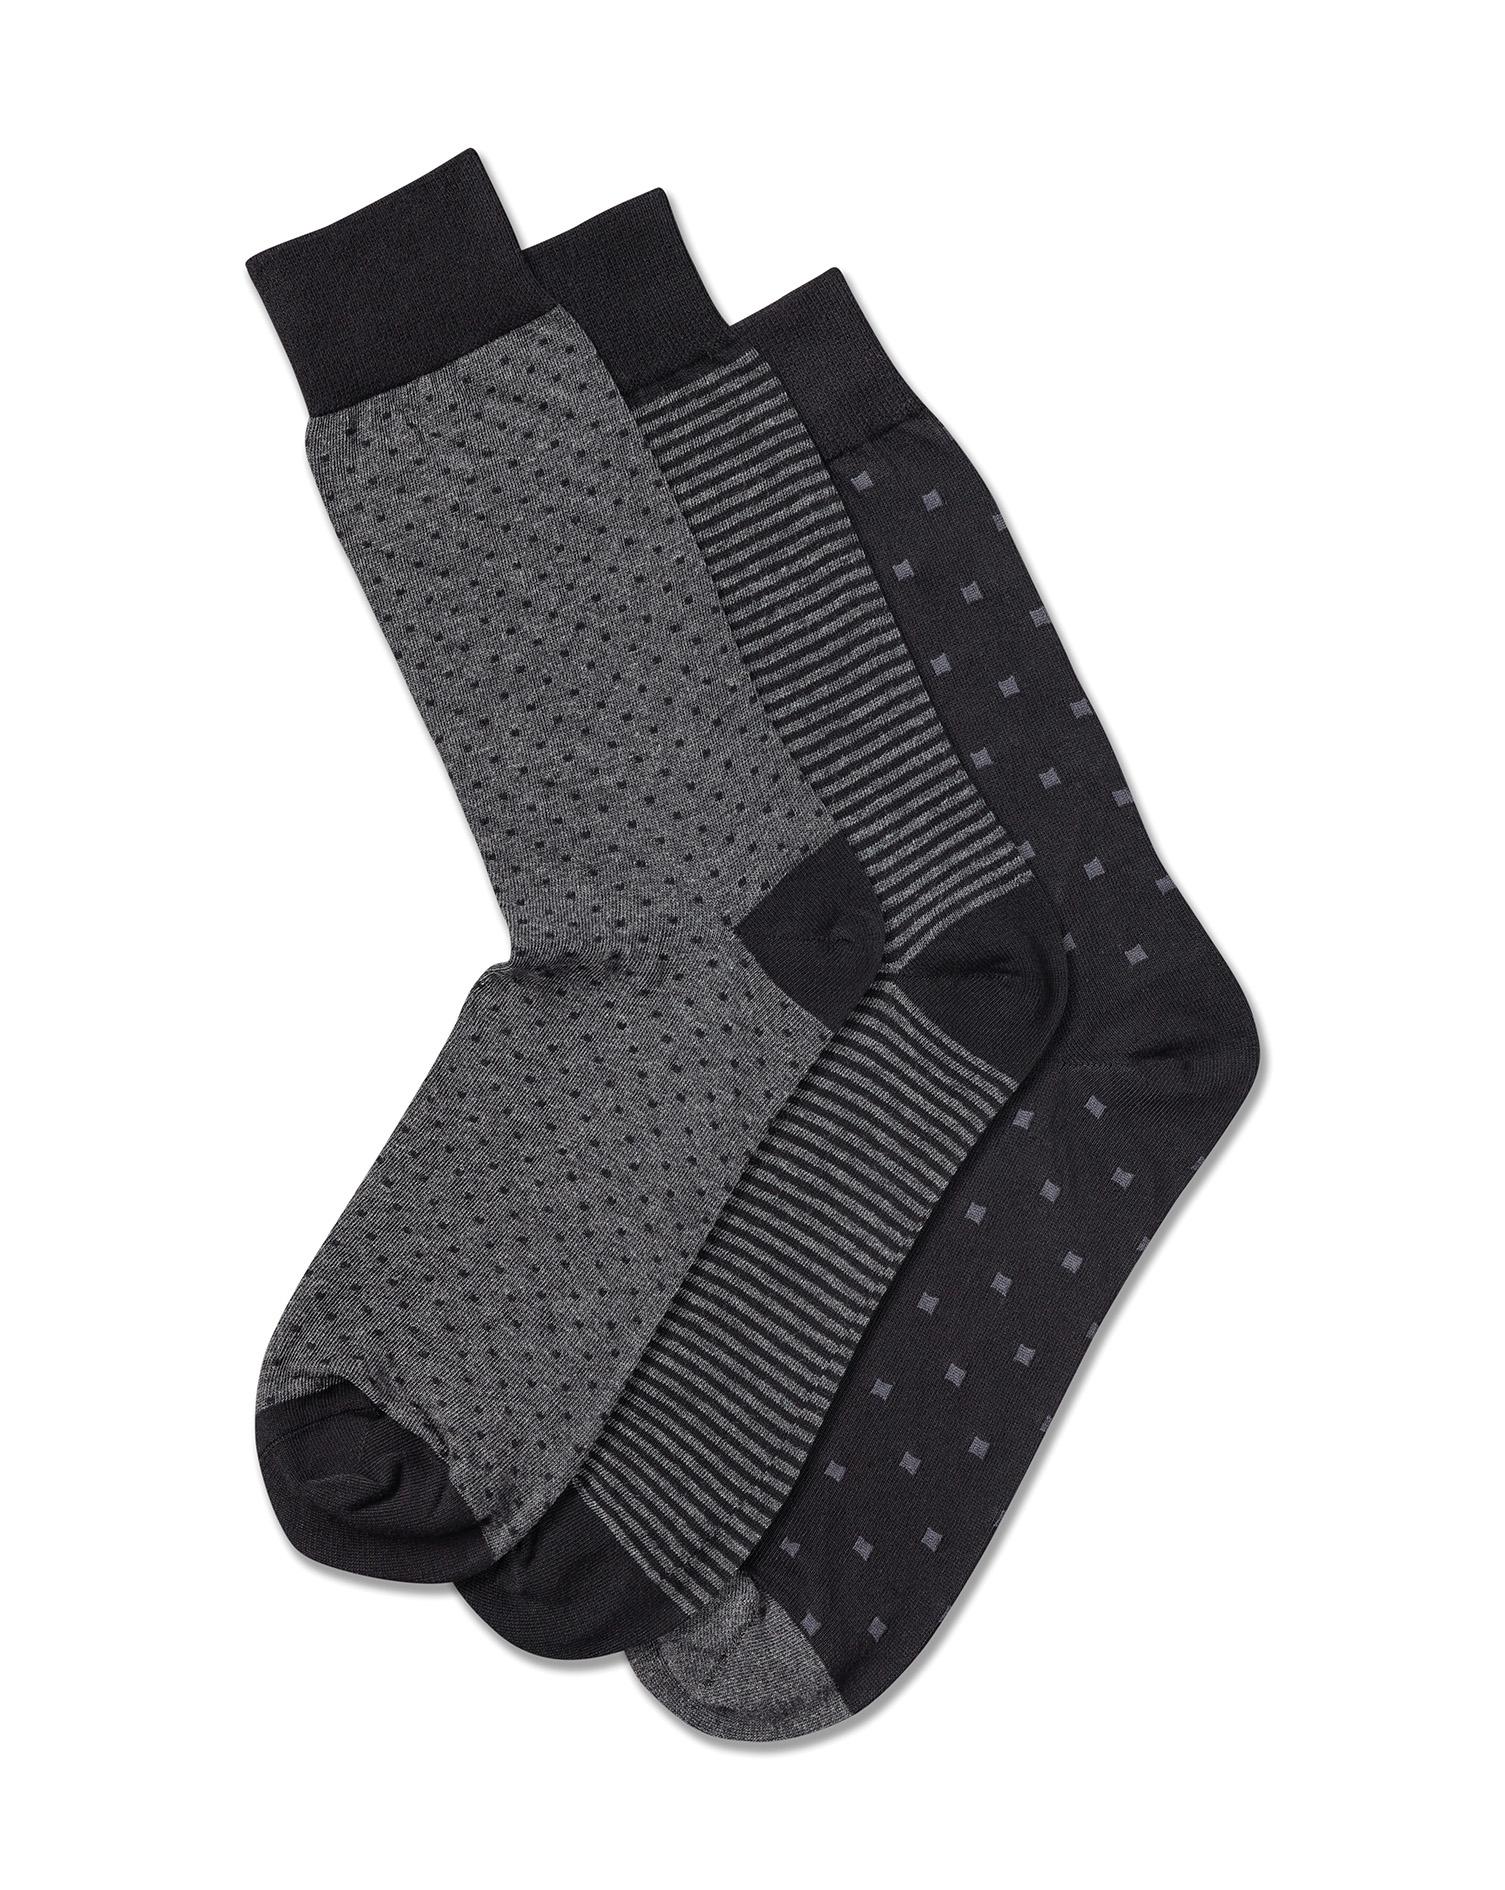 Multi Pattern Cotton Rich 3 Pack Socks Size Large by Charles Tyrwhitt